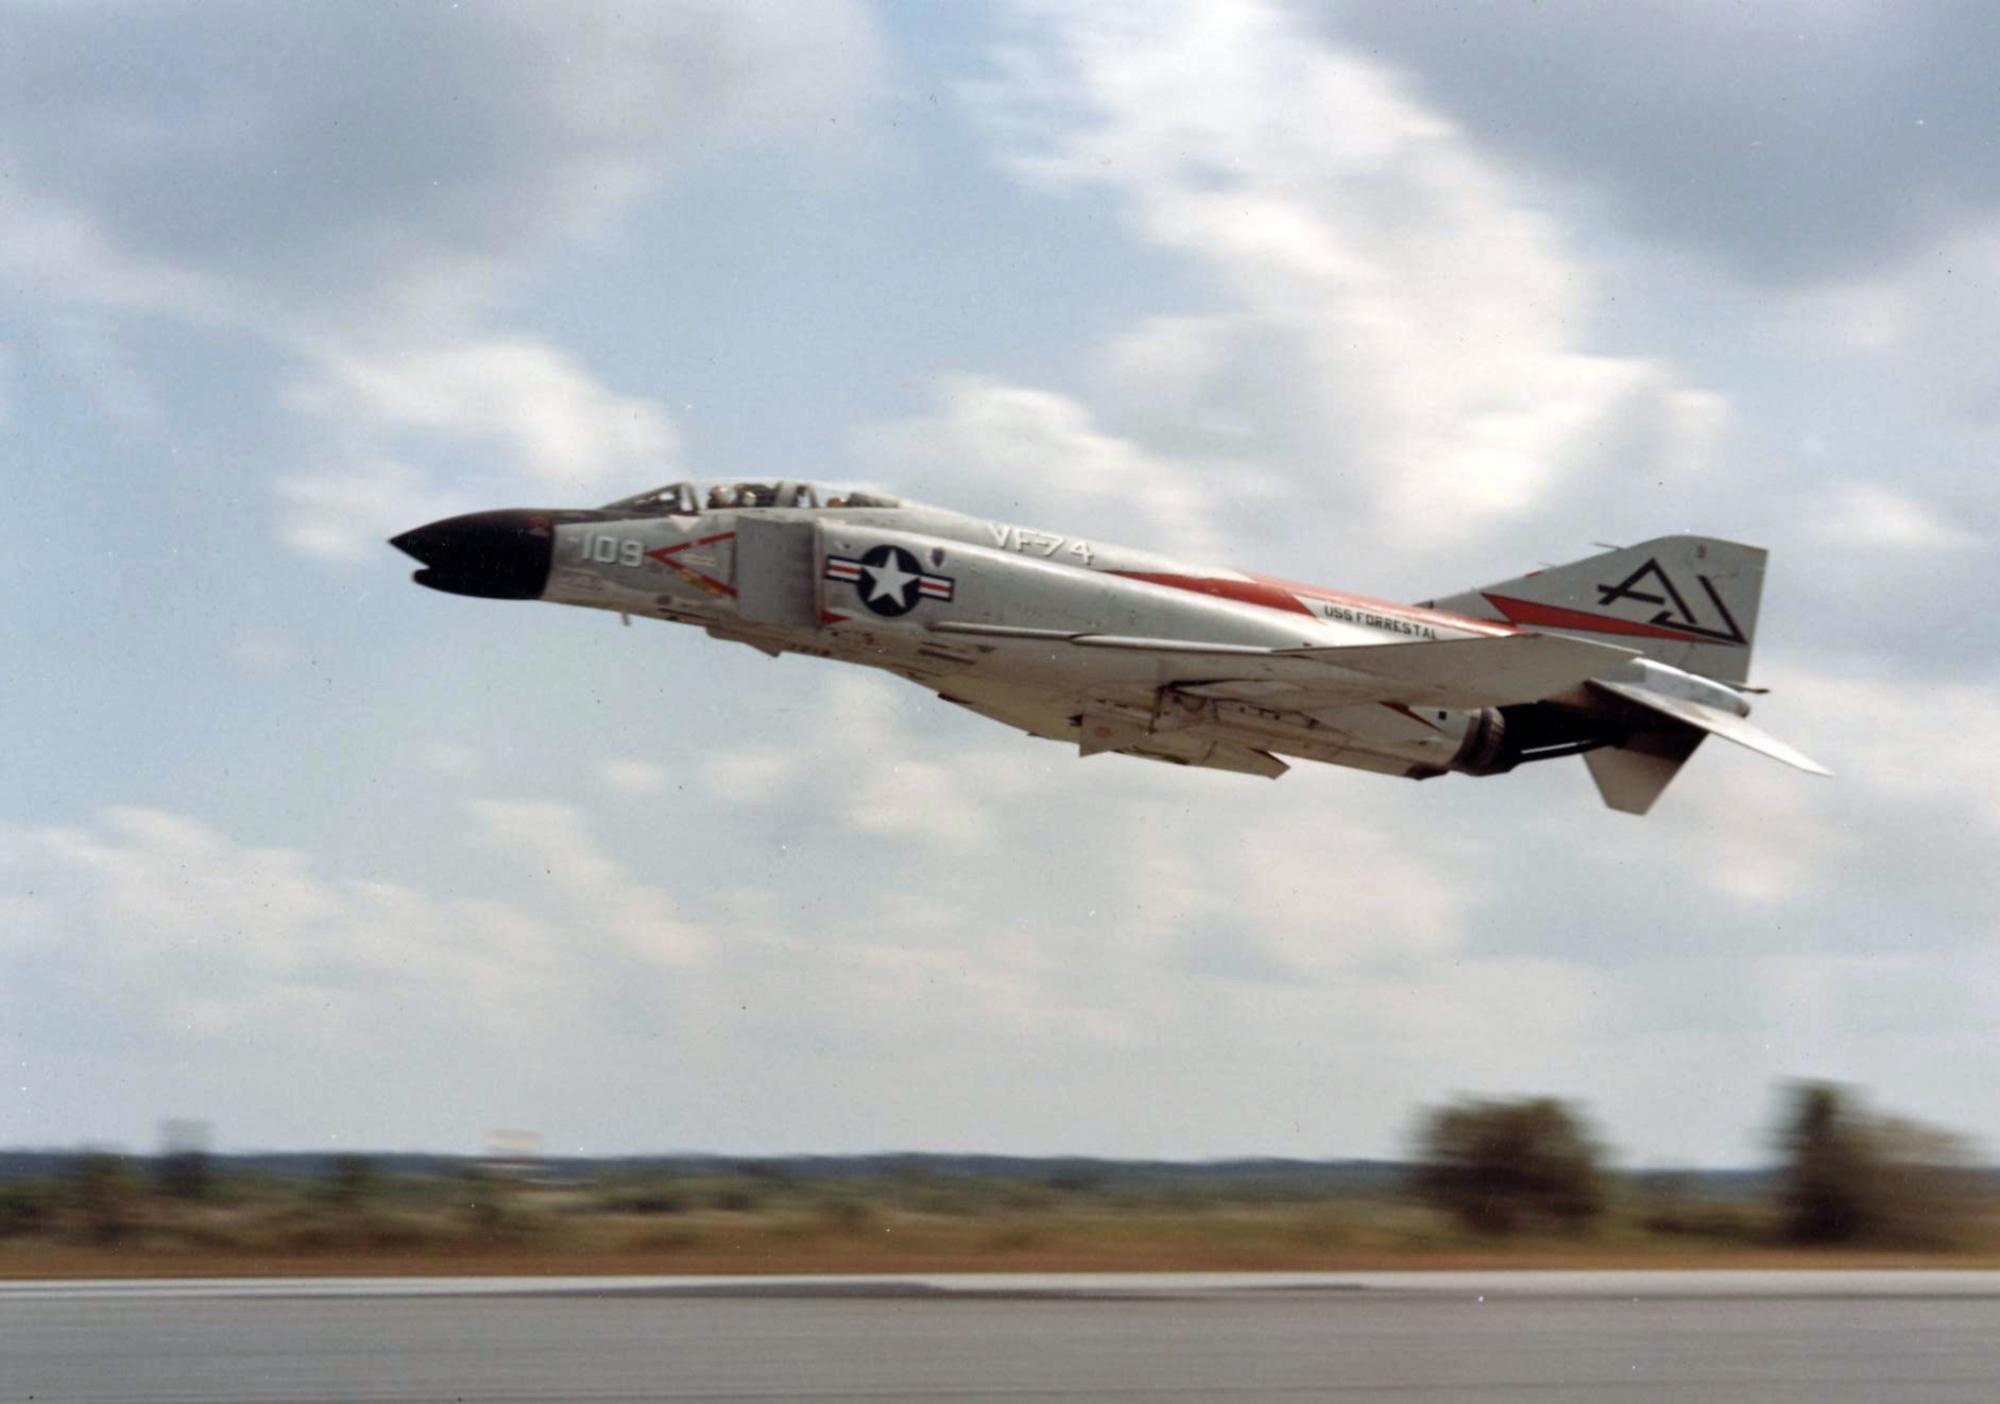 2/illustrations/rr_spey/F-4B_VF-74_taking_off_1961.jpg